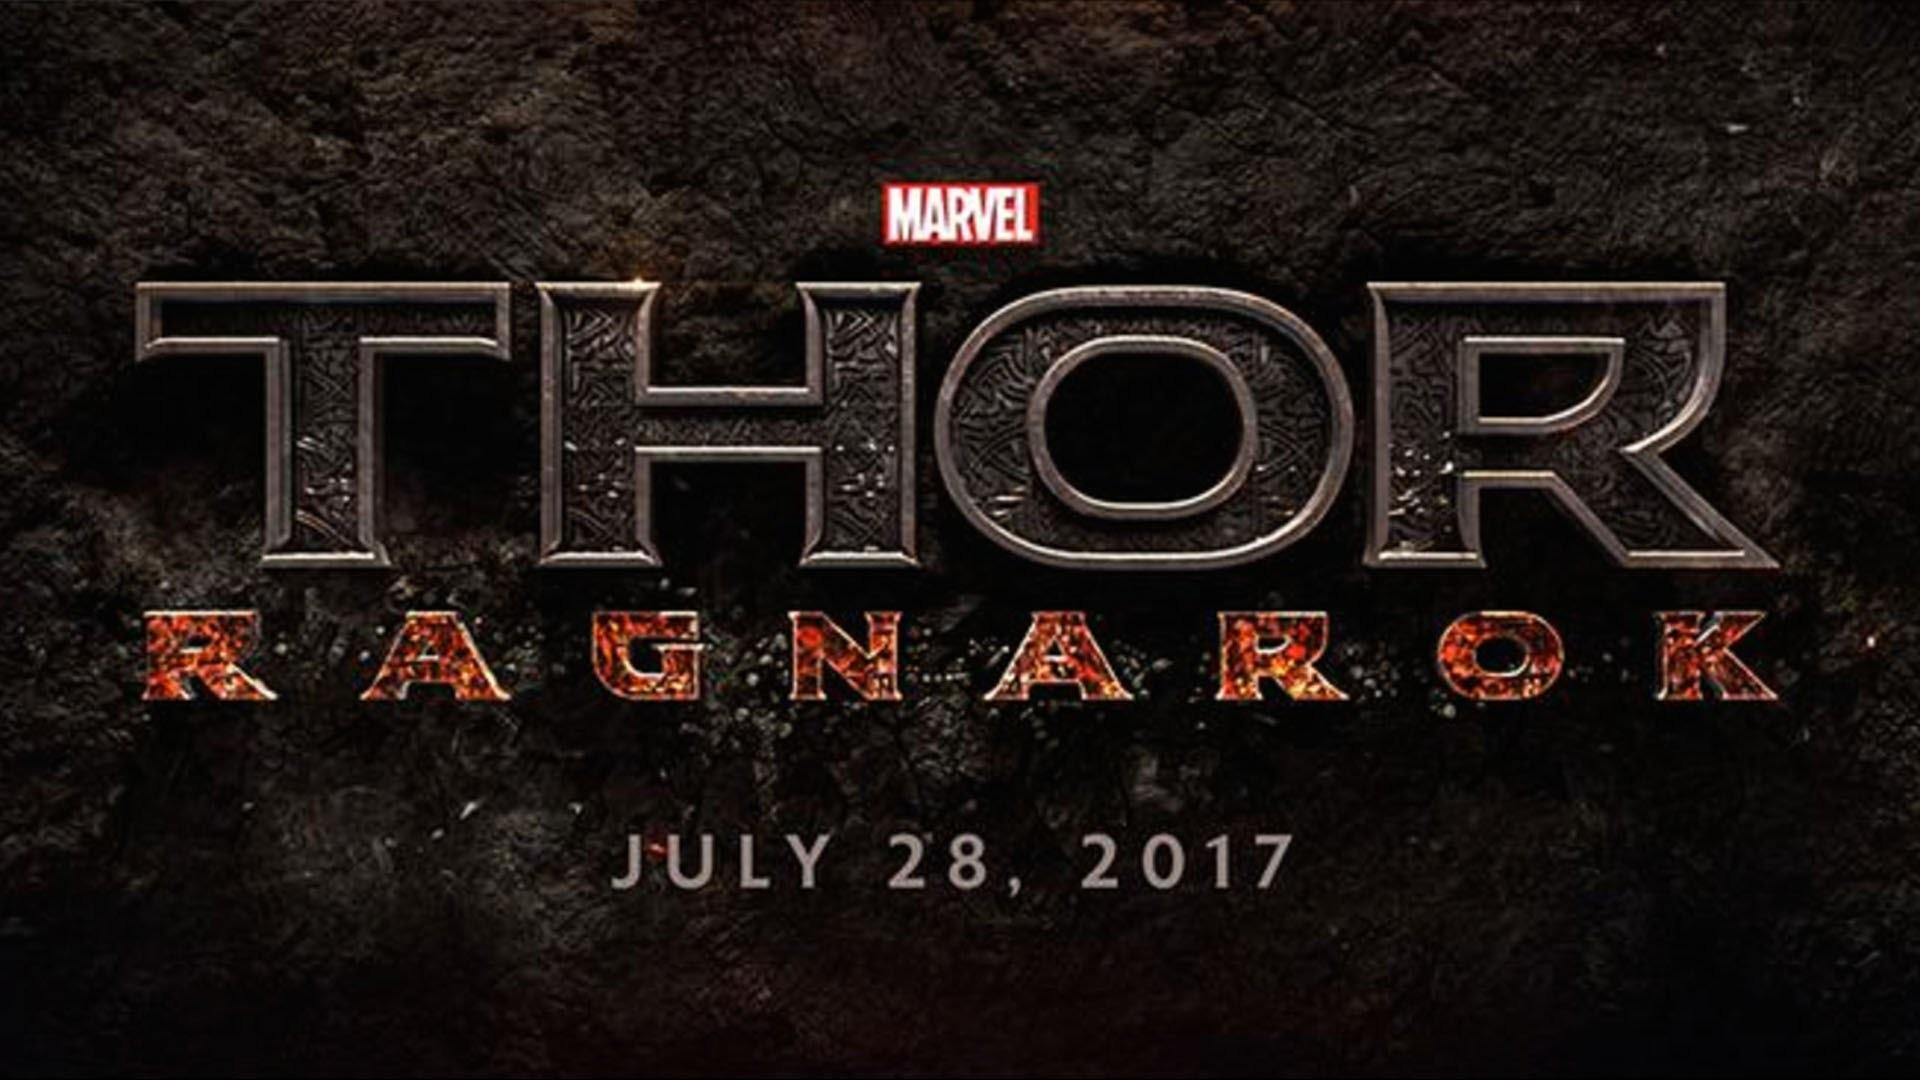 Thor Ragnarok HD wallpapers free download